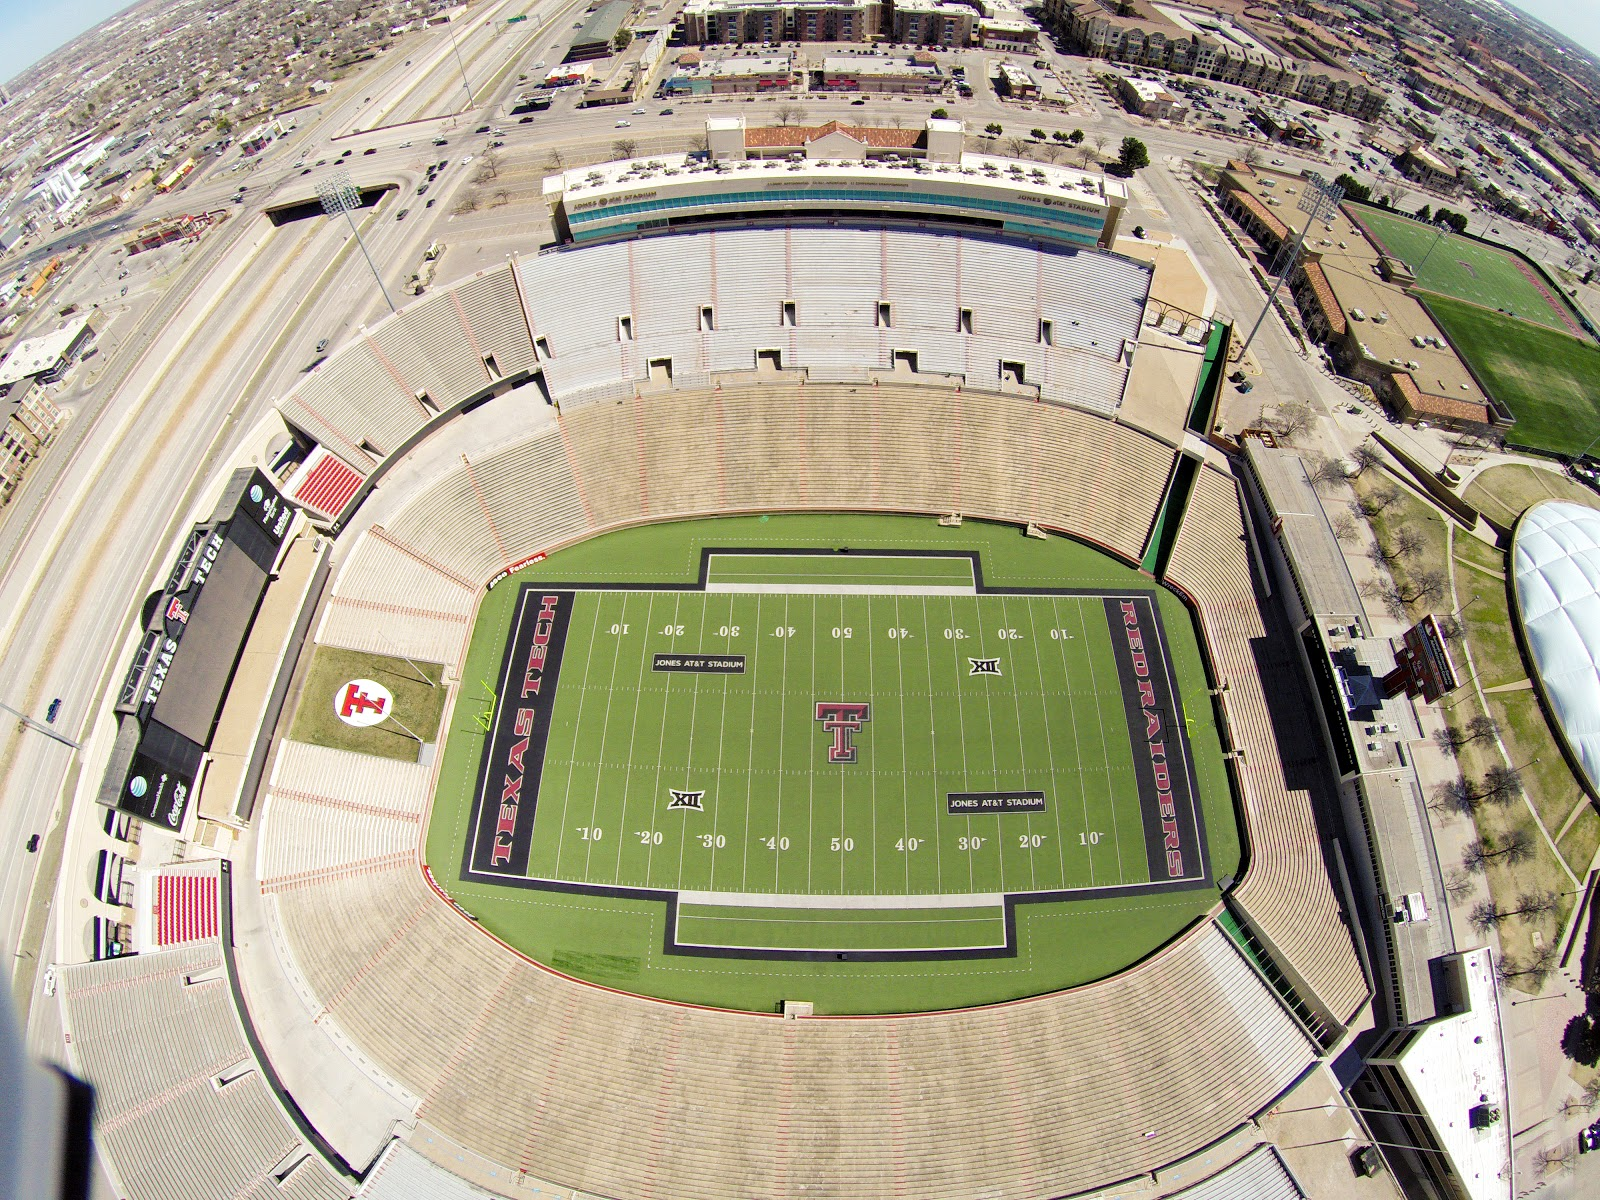 Visit Jones At T Stadium Texas Tech University On Your Trip To Lubbock